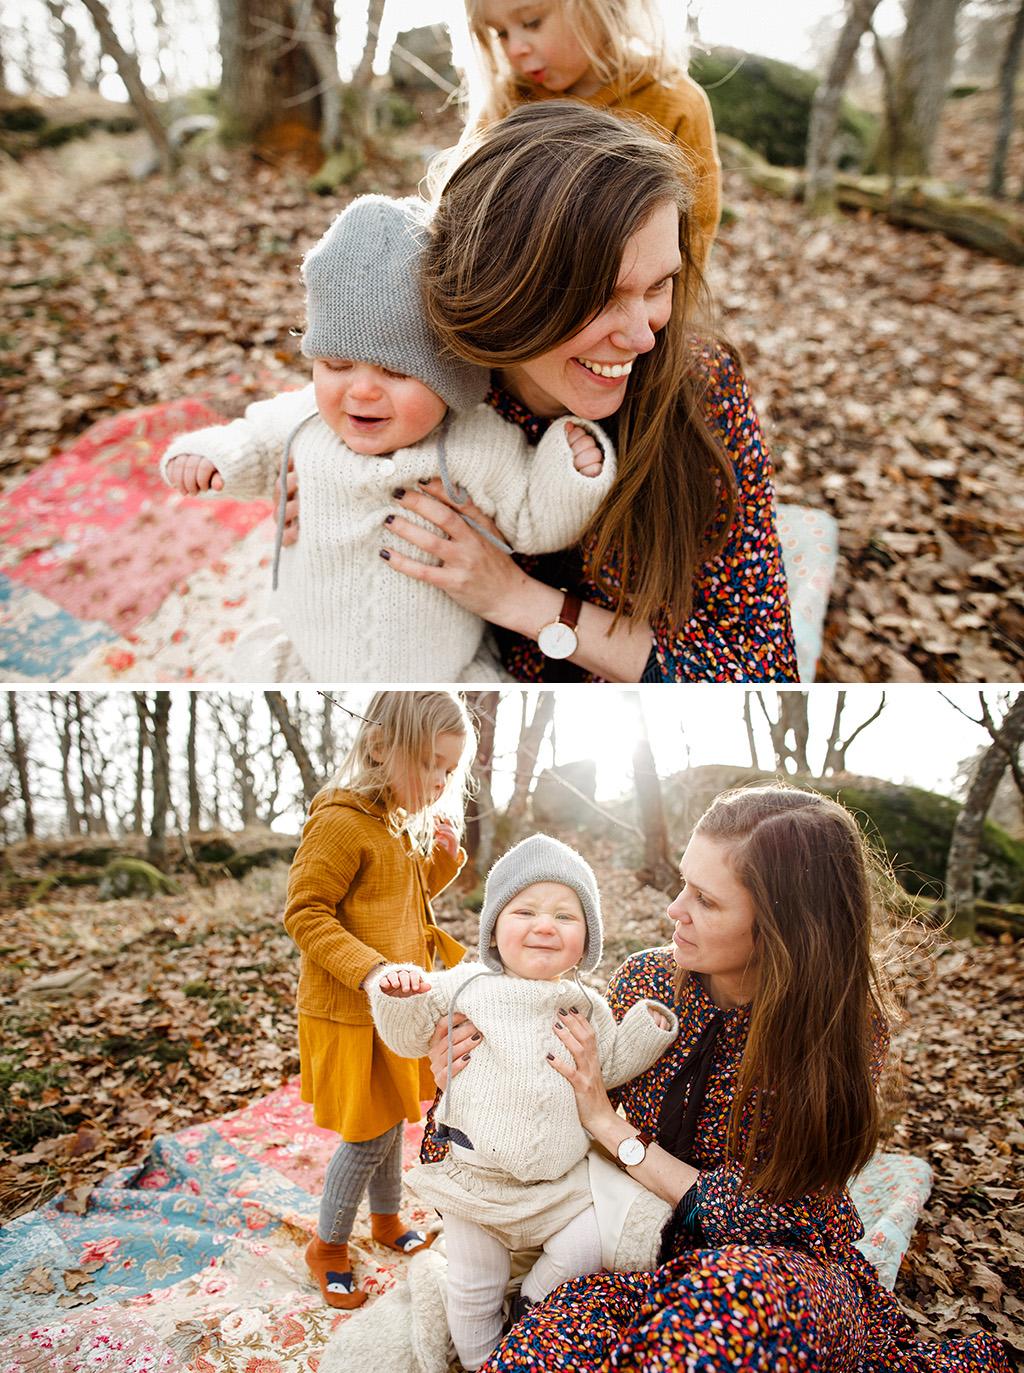 Familjefotograf_Stockholm_Anna-sandstrom_Familjeportratt_Fine-Art-8.jpg